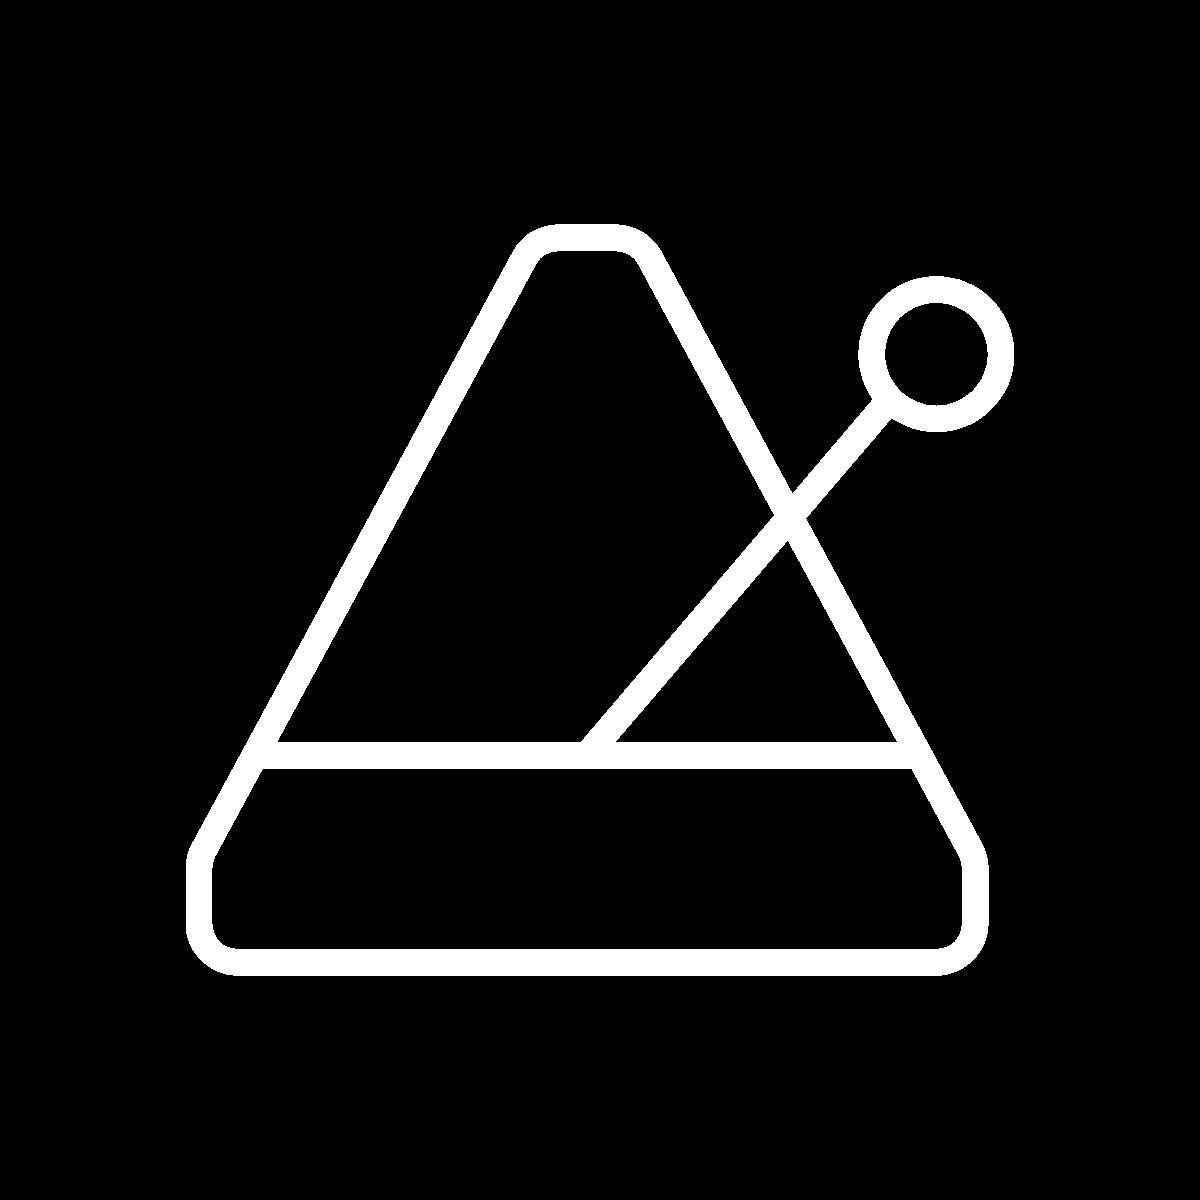 A white illustration of a metronome.